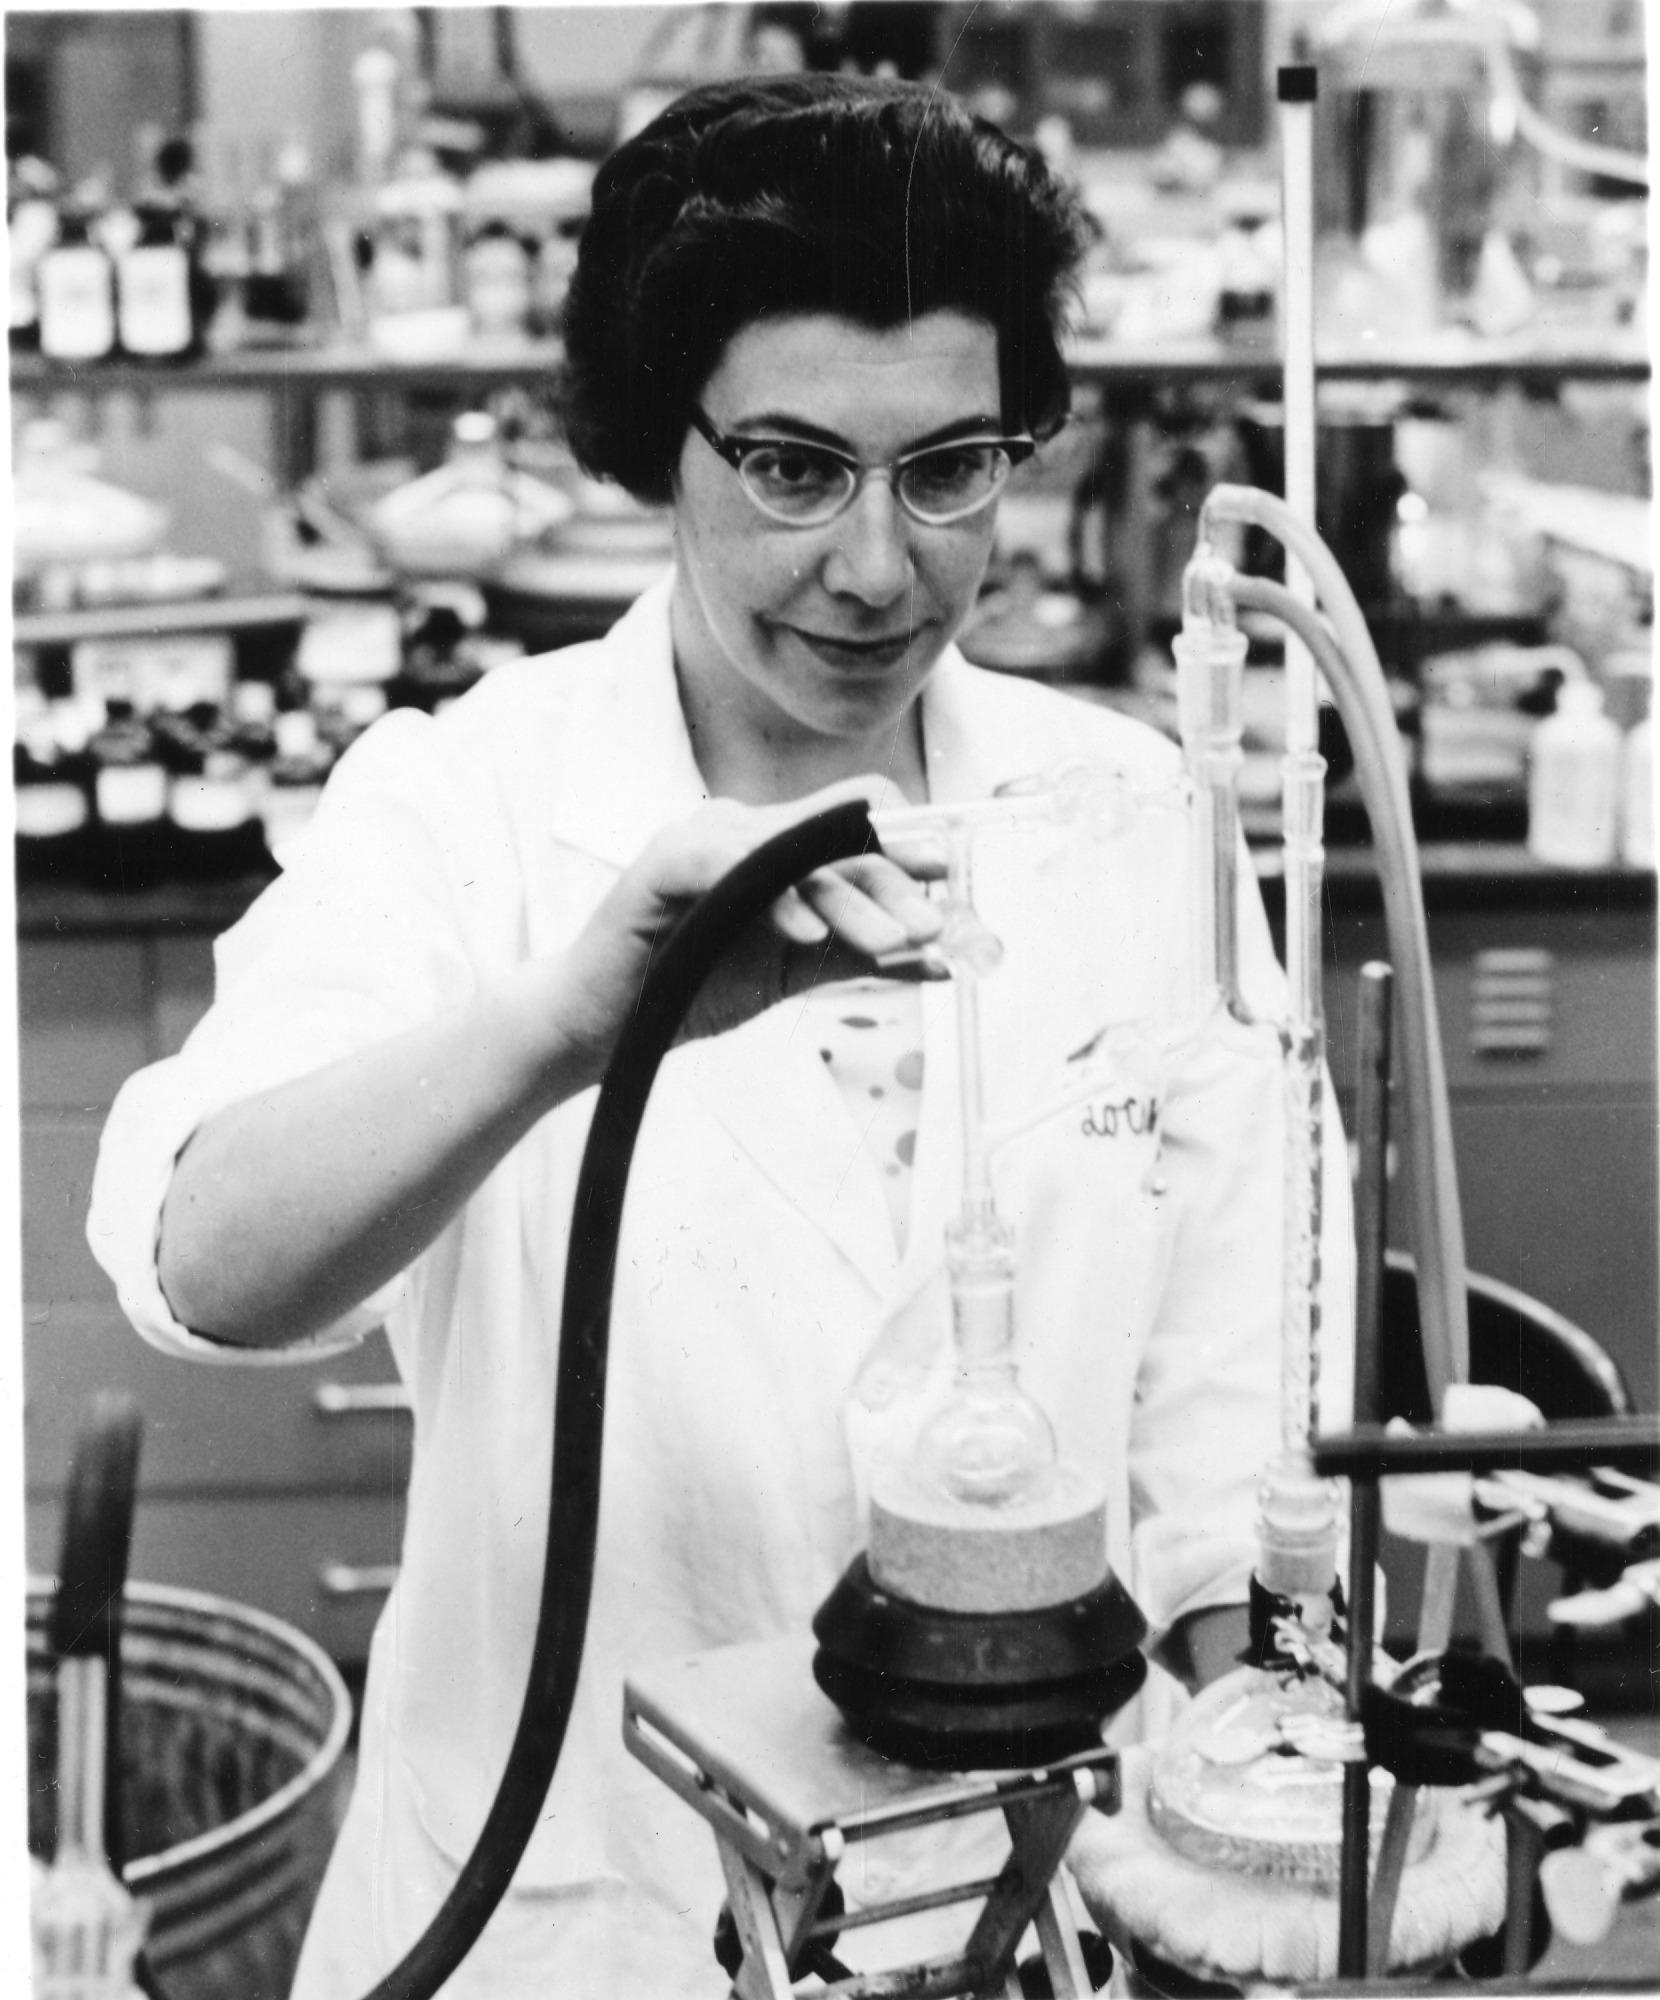 Jeanne Helen Osiecki (b. 1926), Smithsonian Institution Archives, SIA Acc. 90-105 [SIA2009-0735].